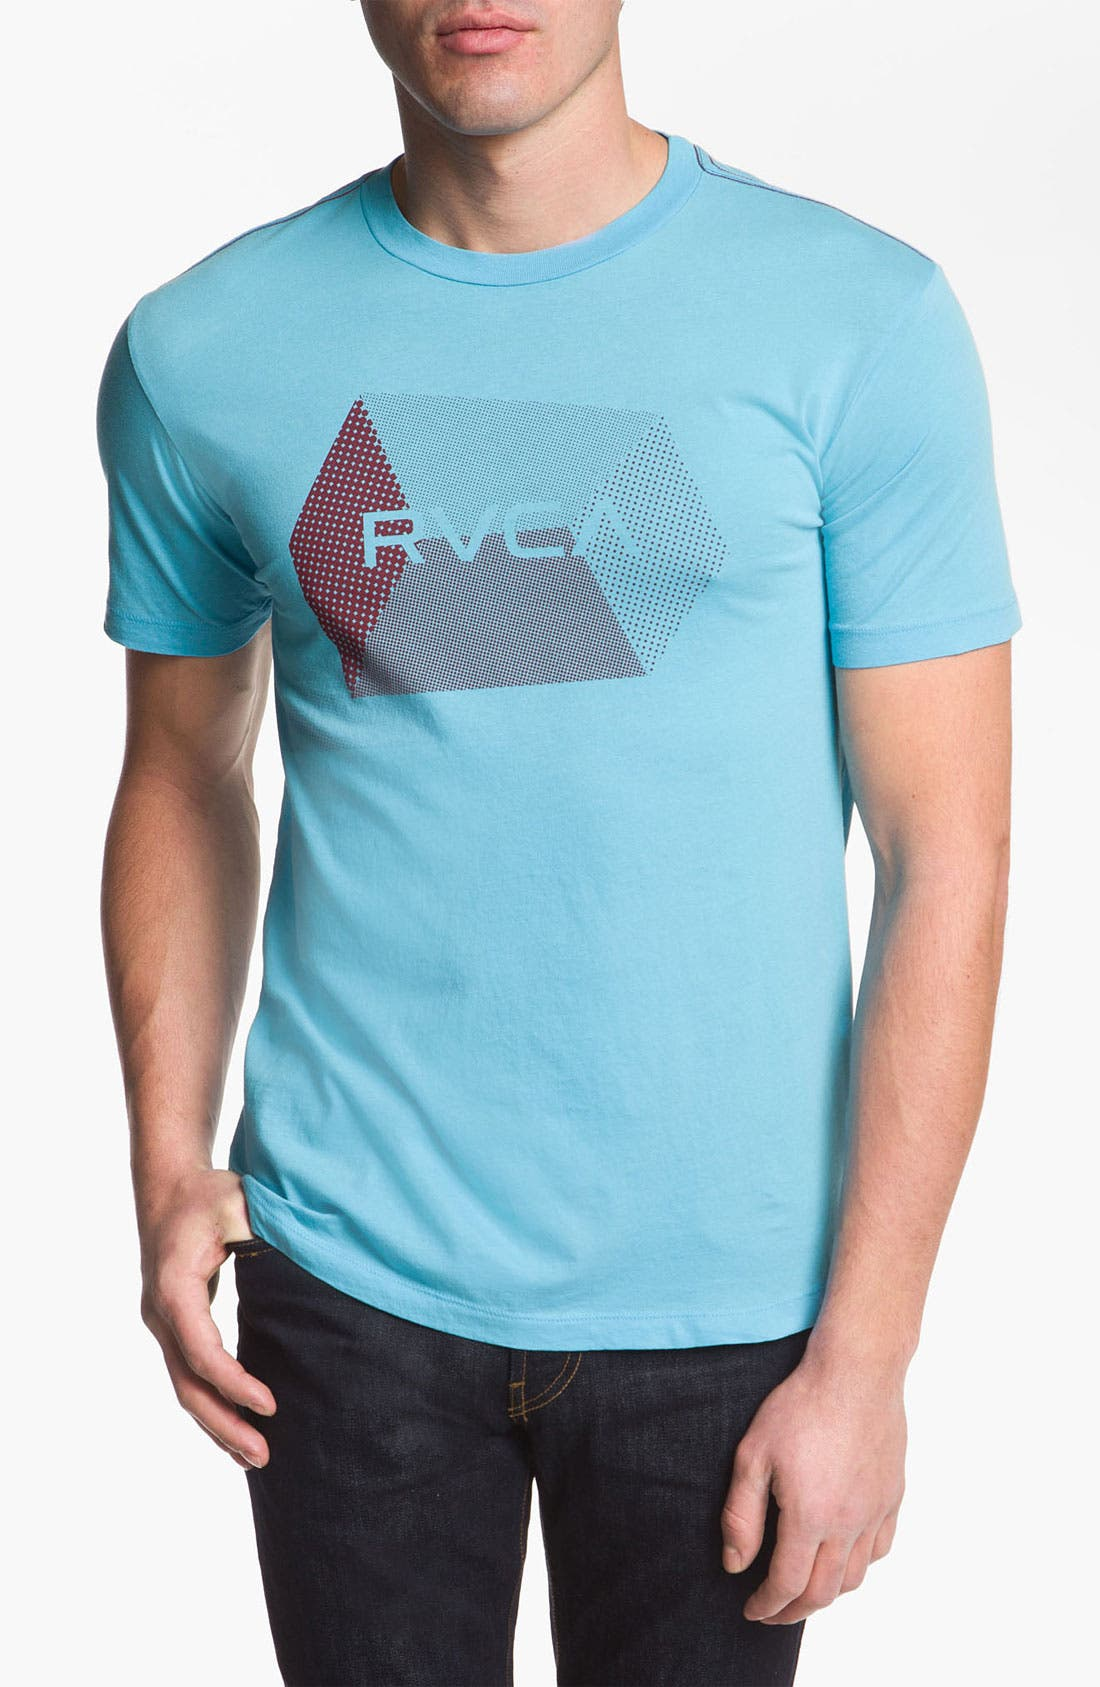 Main Image - RVCA 'Polygon Hex' Graphic T-Shirt